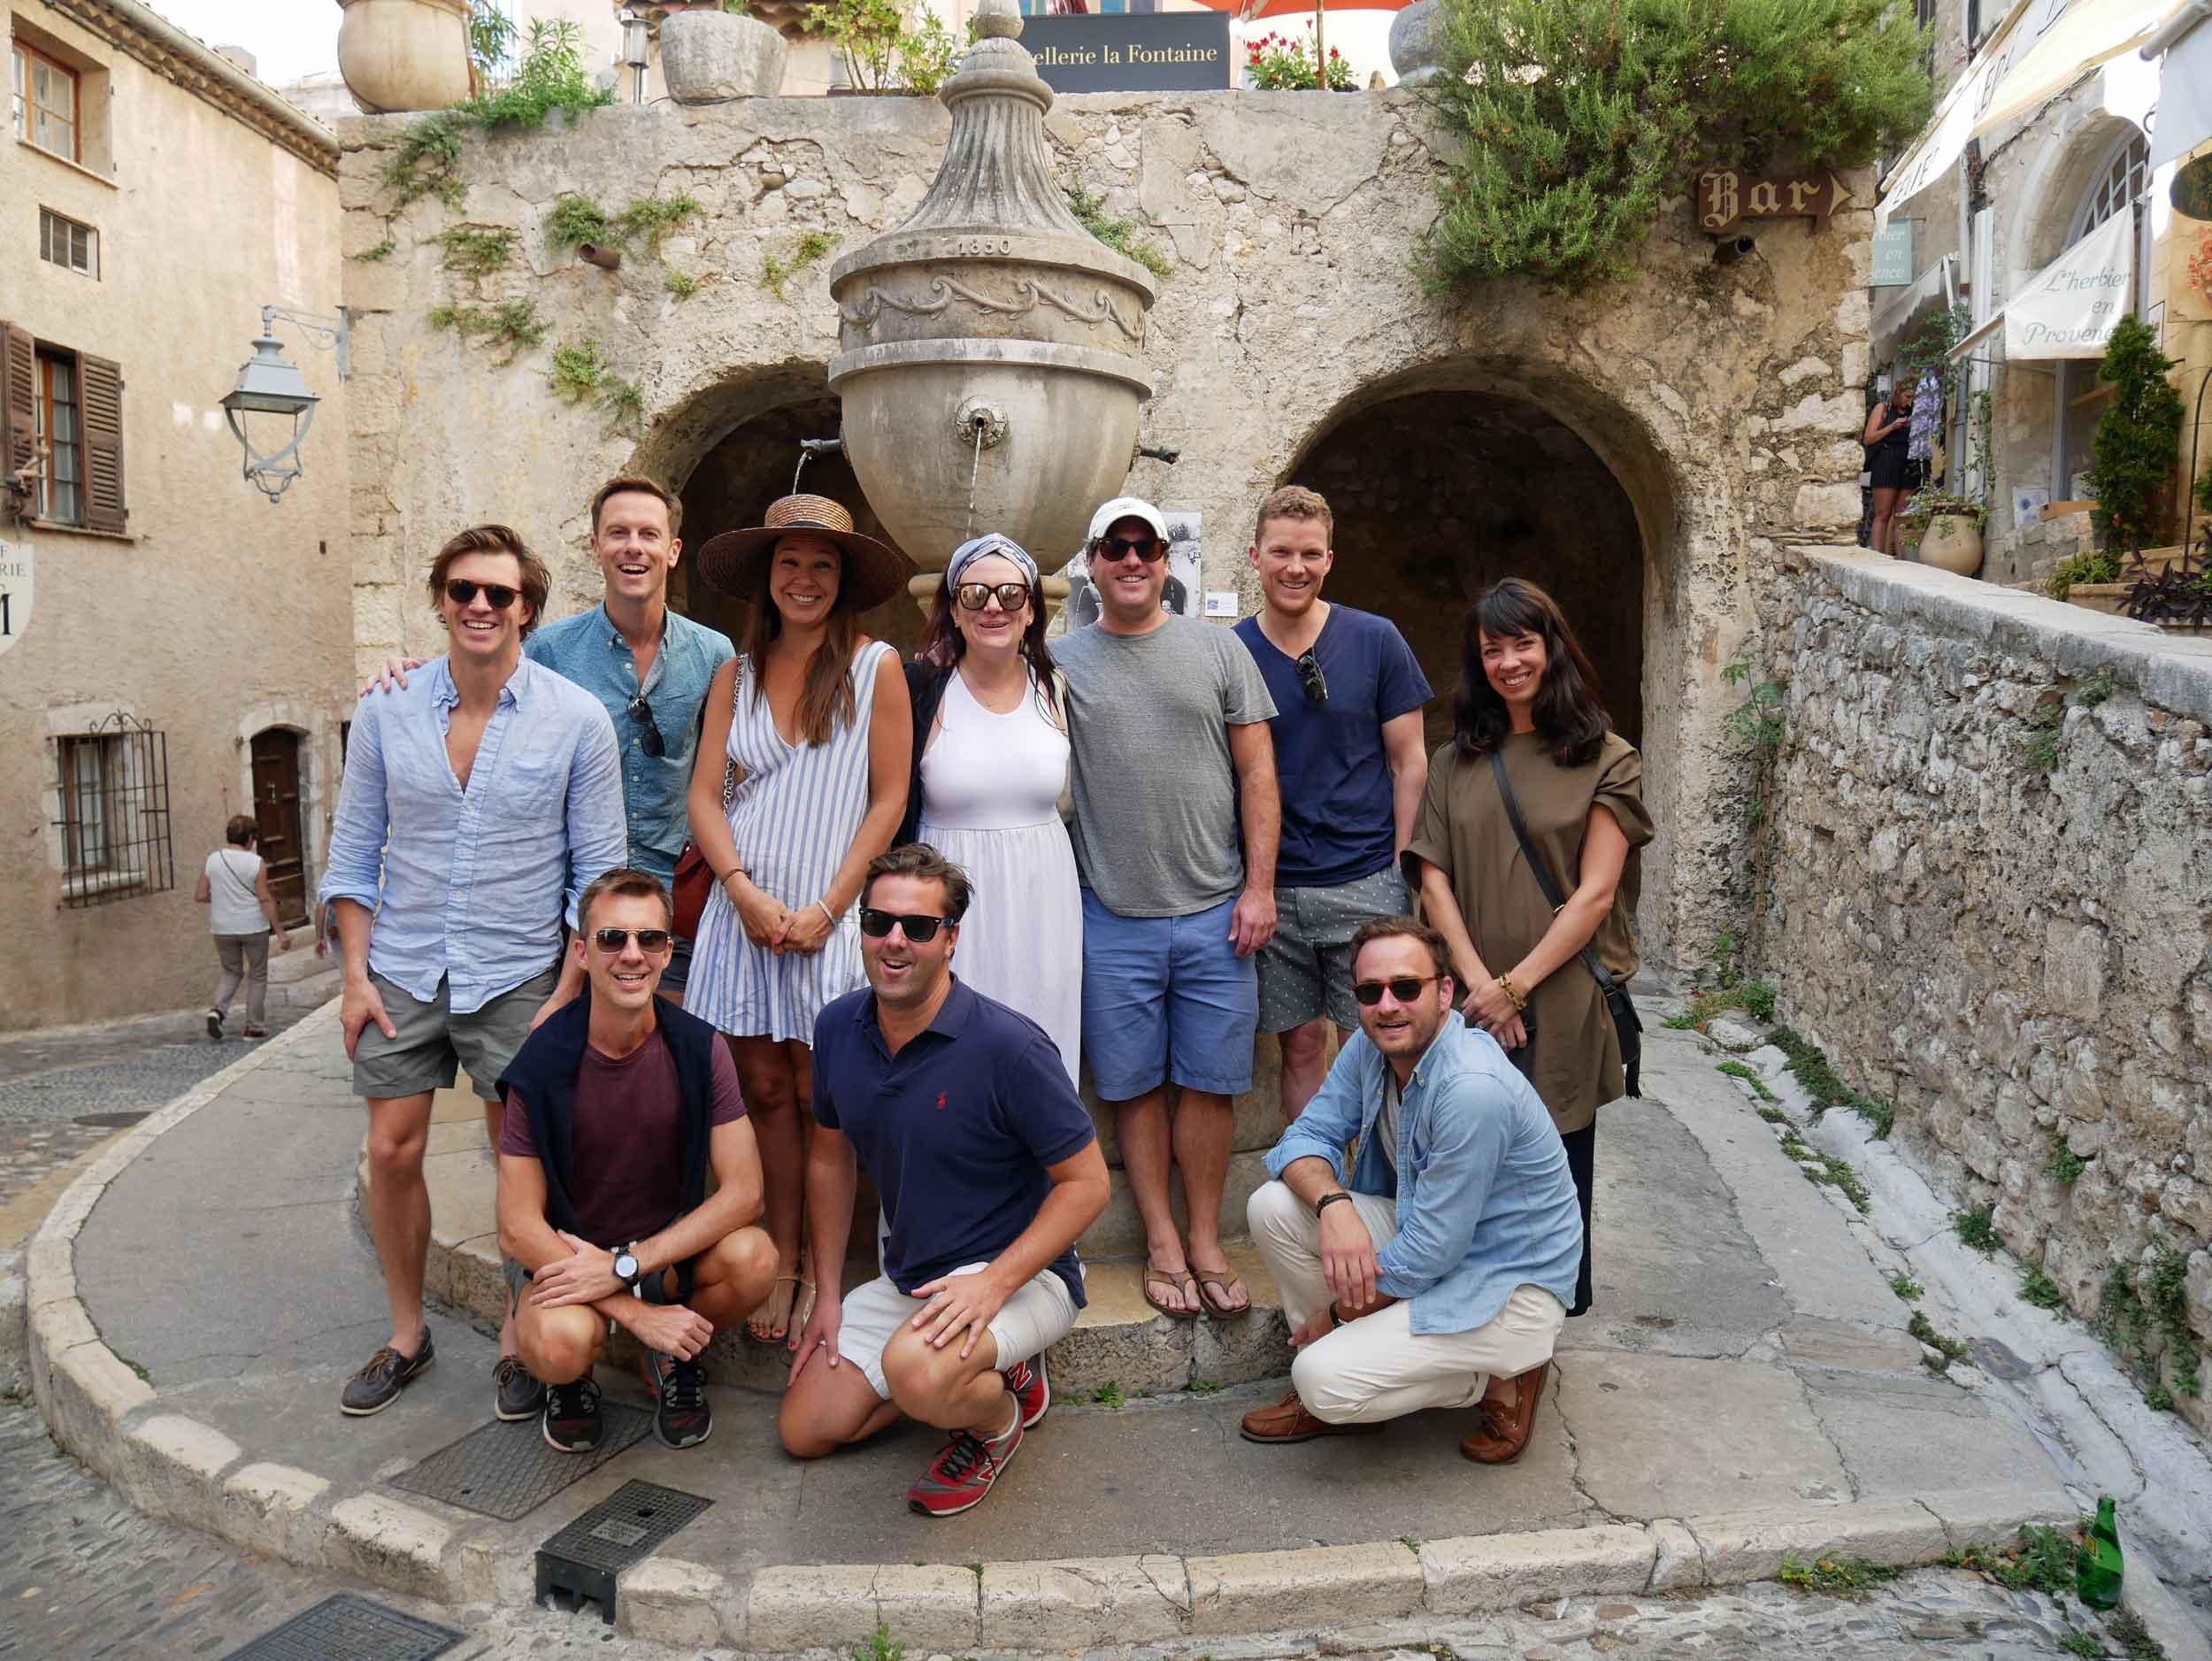 Les Amis en France!We felt so fortunate to have our dearest near us. Here's the gang exploring the adorable village of St. Paul de Vence (Sept 16).